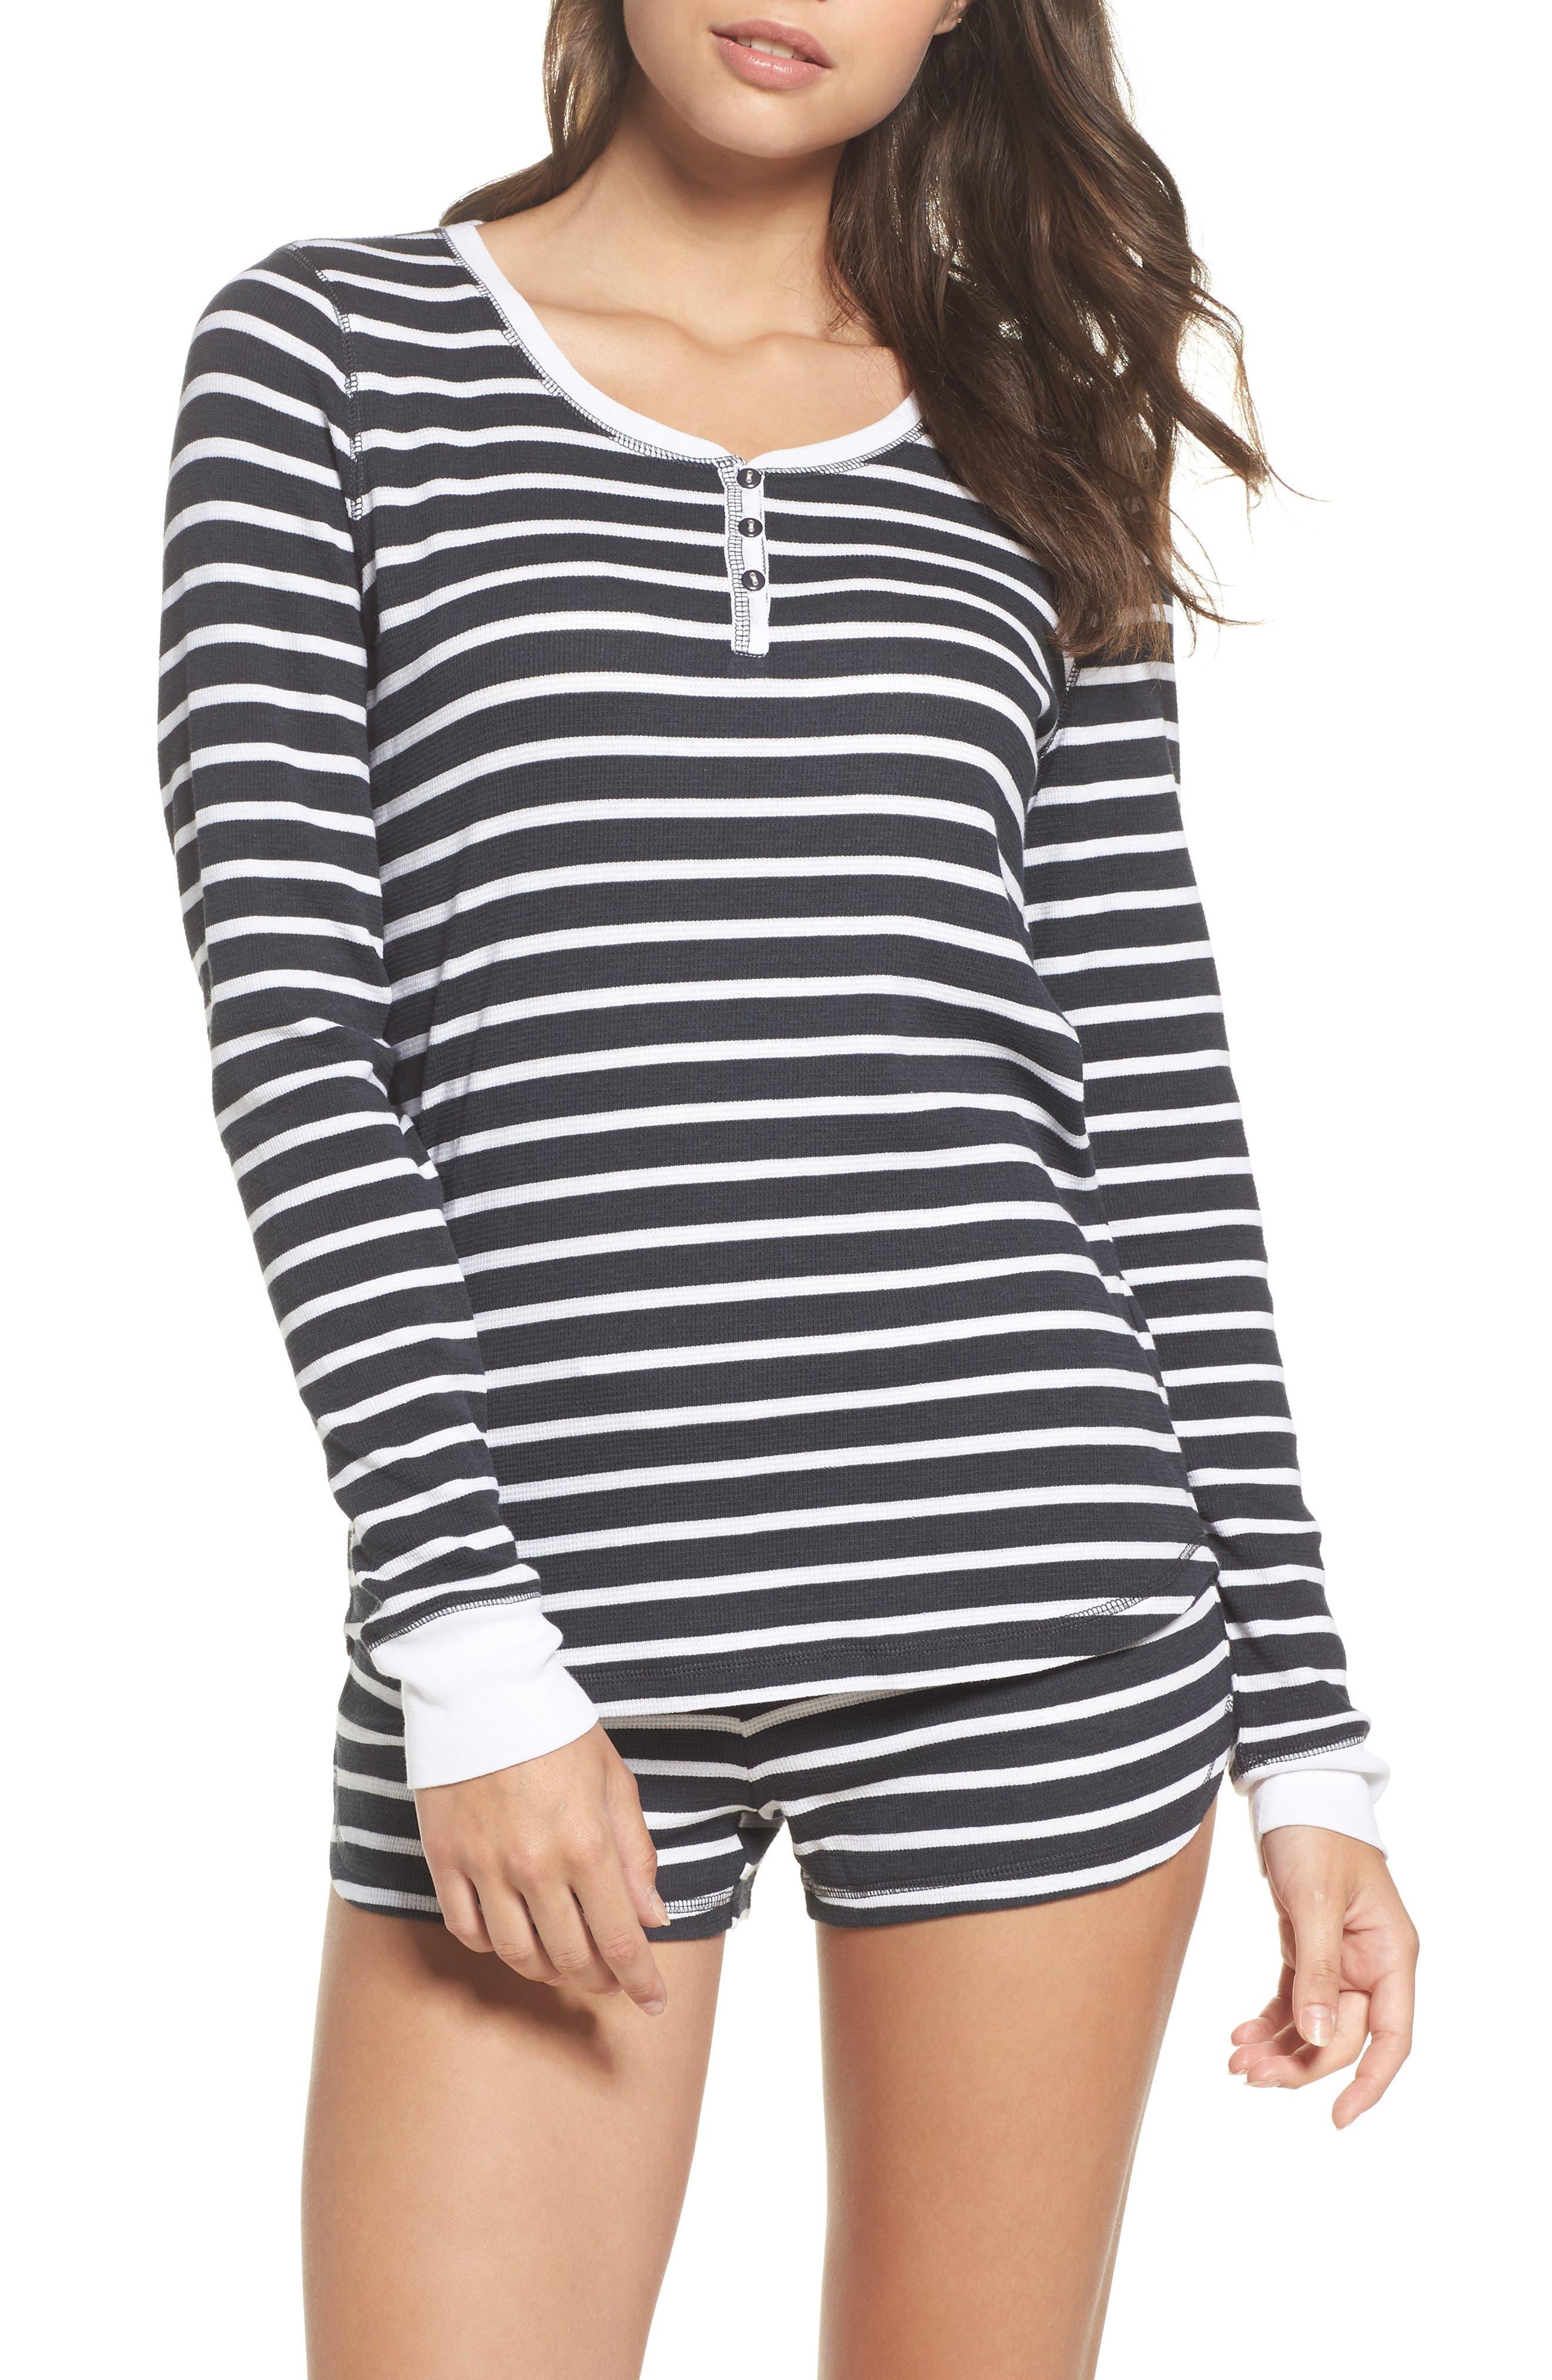 Short Pajamas,                         Main,                         color, 020